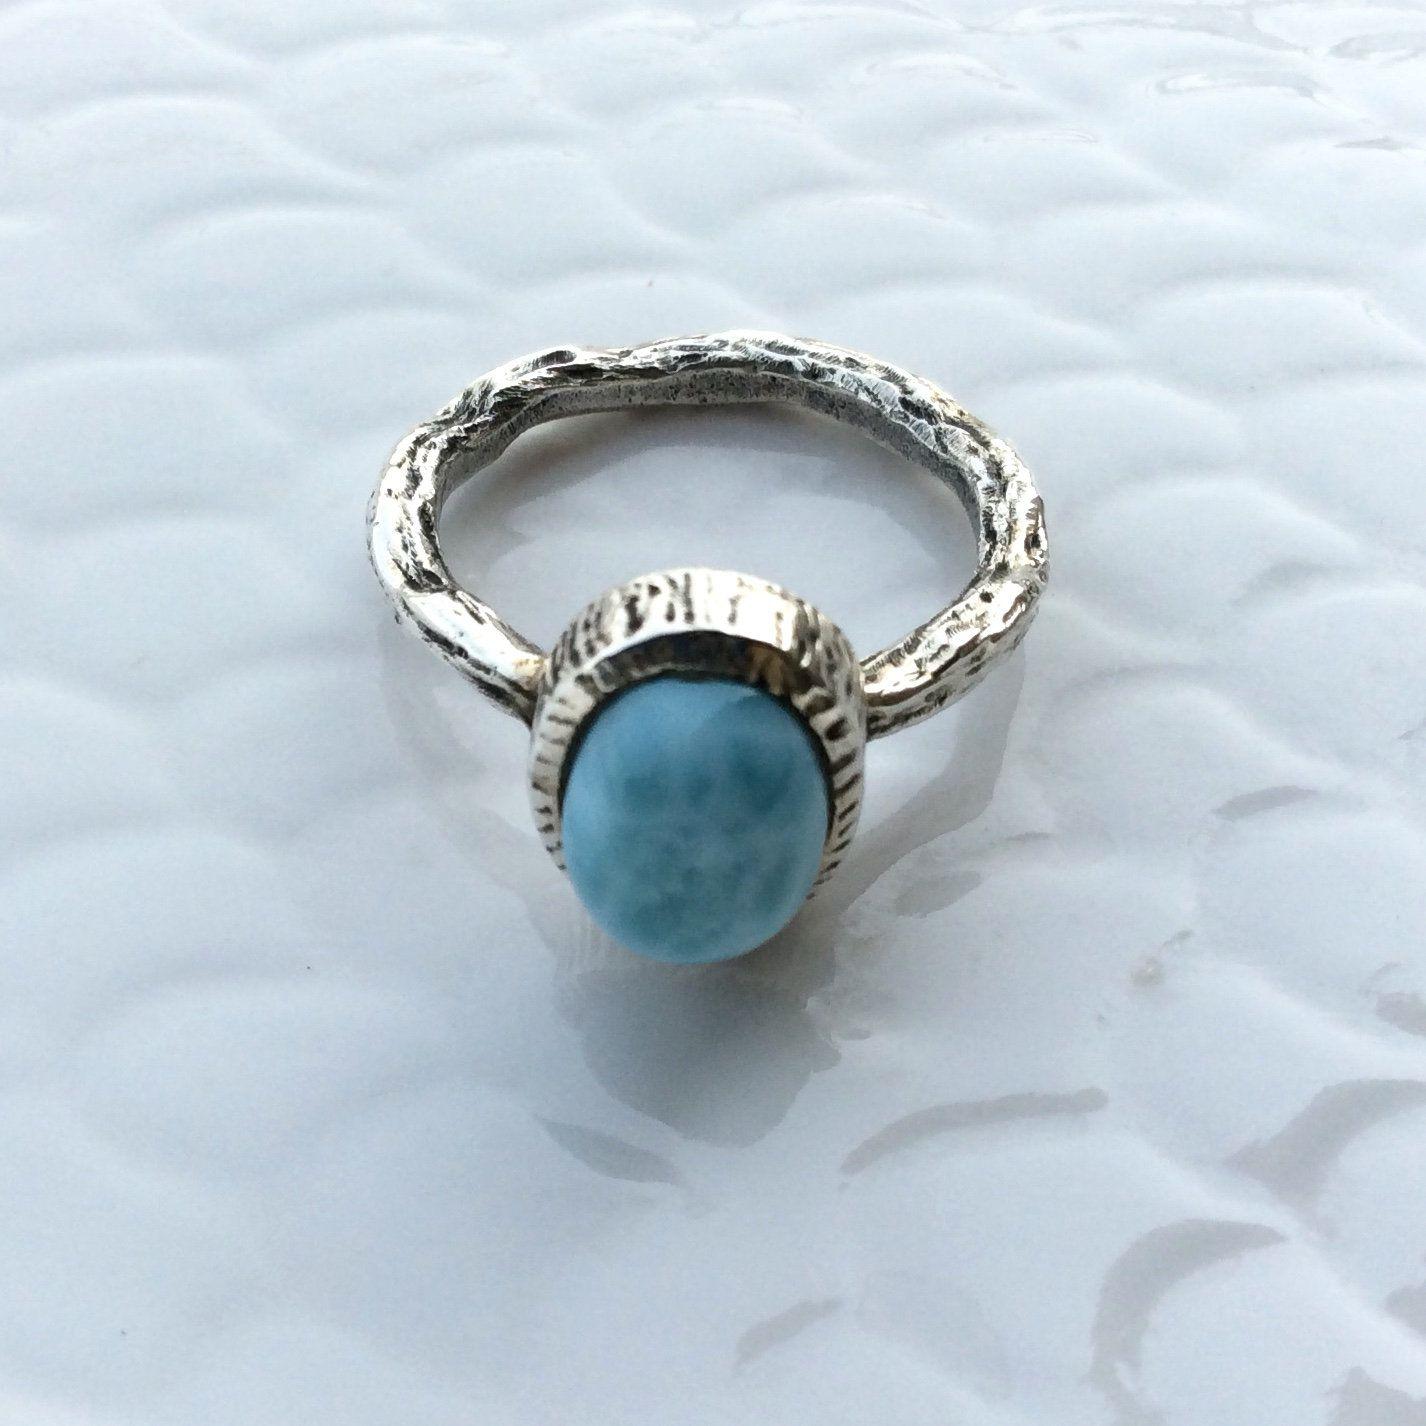 Larimar Ring Larimar Ring Size 6 50 Natural Larimar Gemstone Etsy Gold Diamond Wedding Band Raw Gemstone Jewelry Diamond Wedding Bands